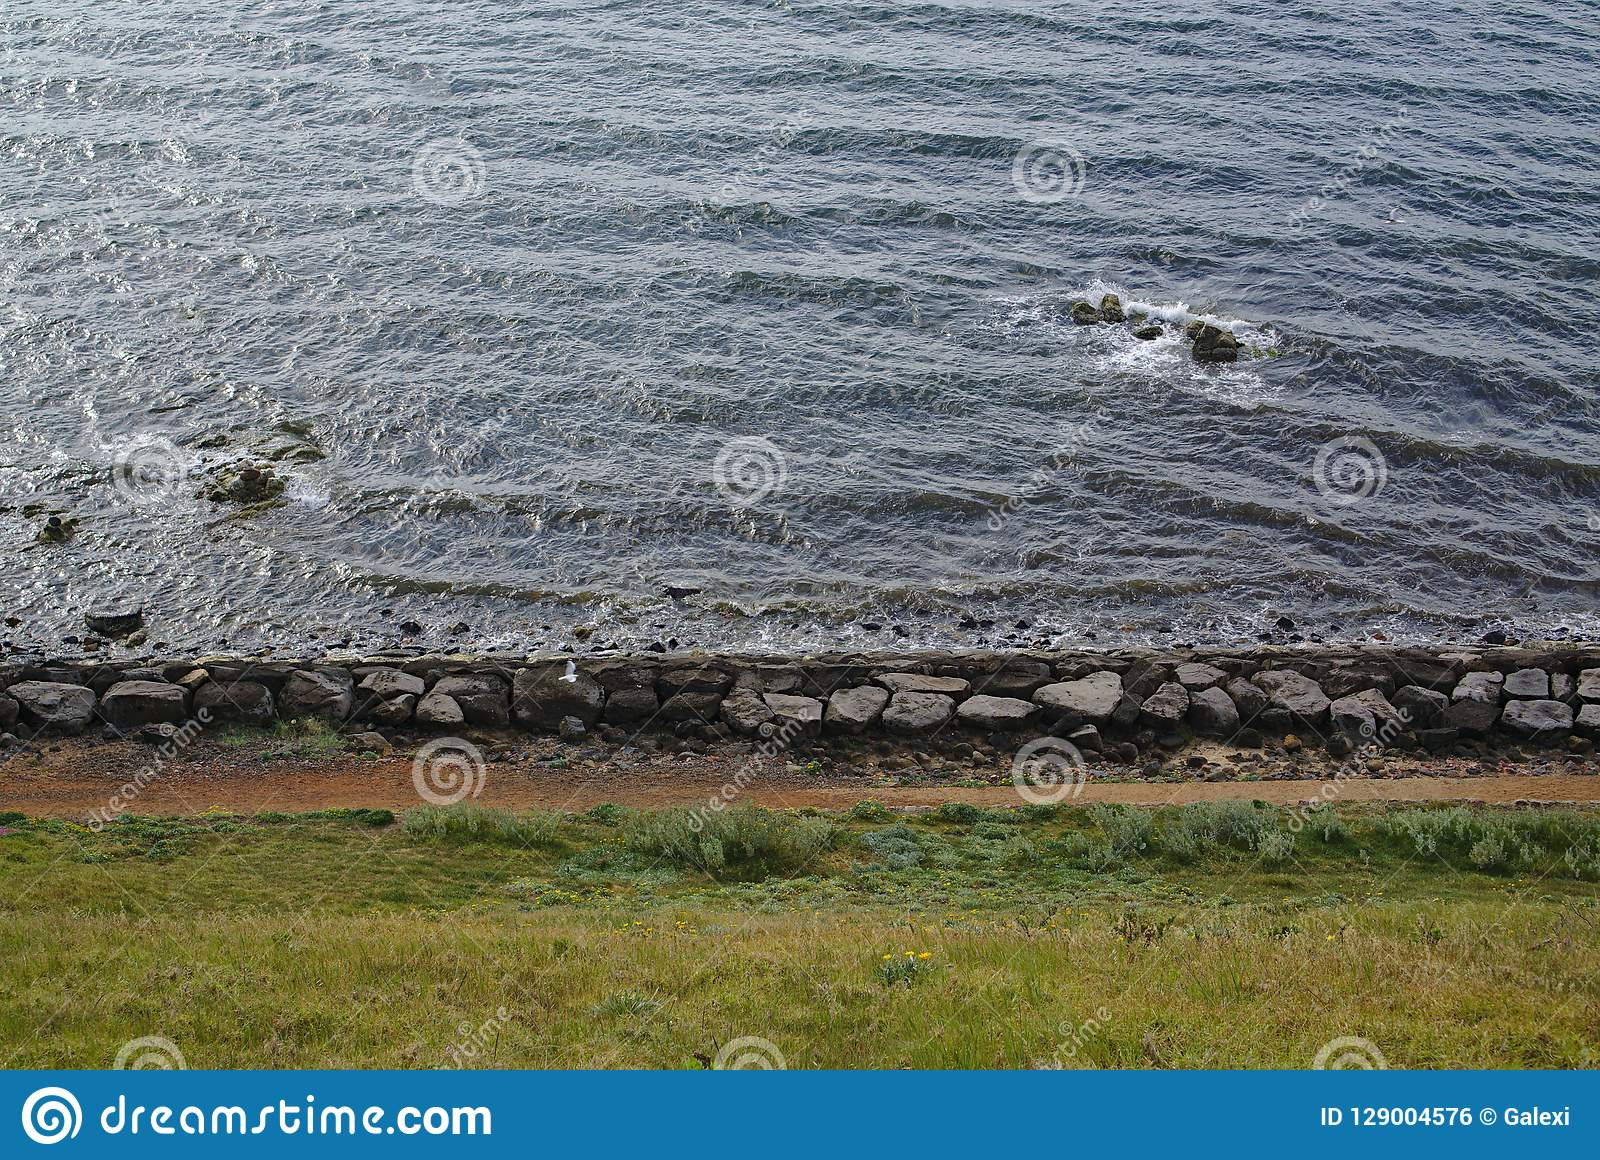 Kant van strand met grote stenen en groen gras